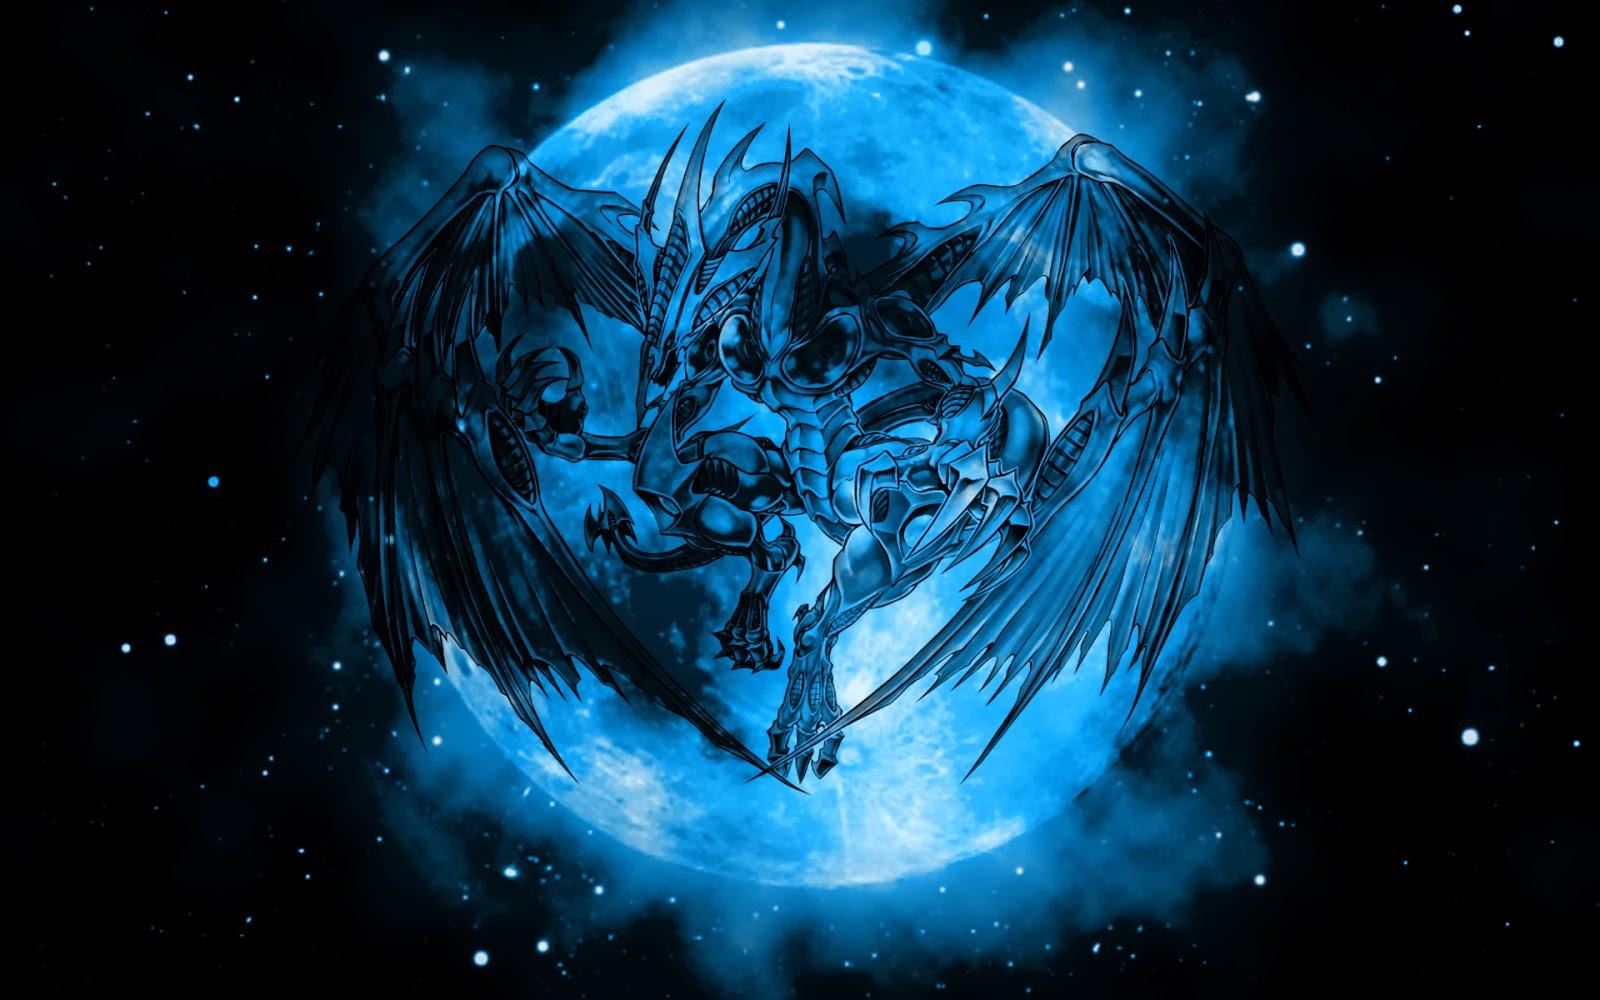 Dragons And Skulls Wallpaper